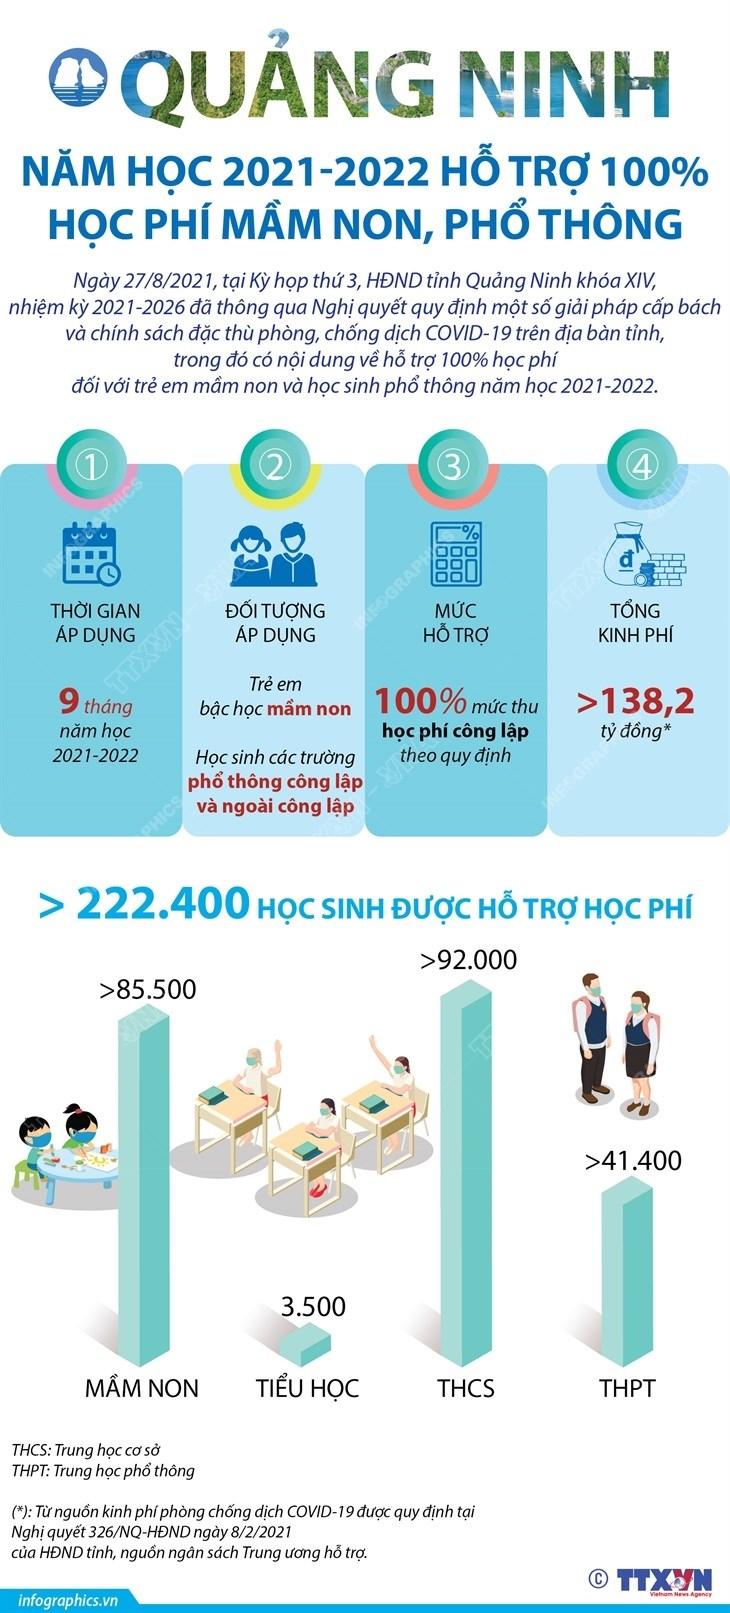 [Infographics] Chi tiet viec Quang Ninh mien hoc phi cho hoc sinh hinh anh 1